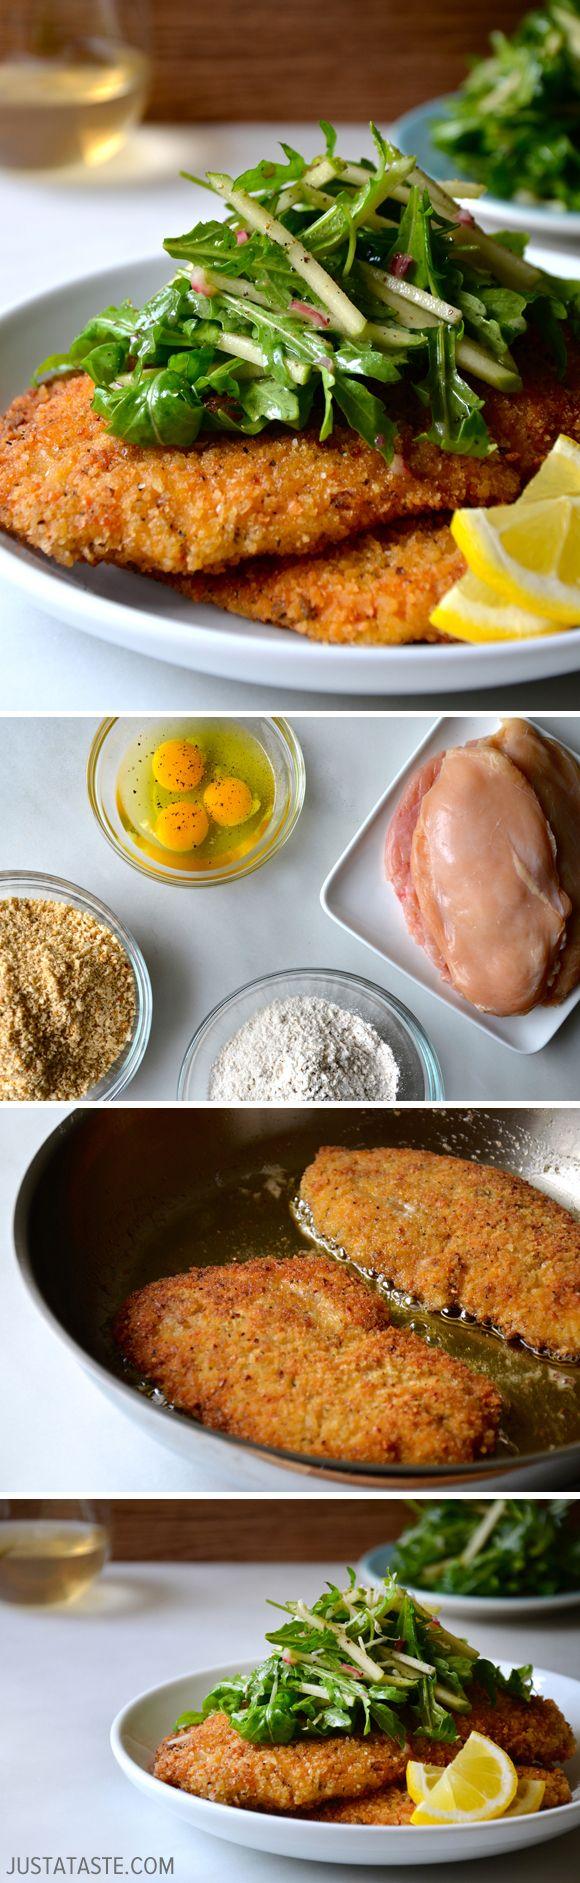 Chicken Milanese with Green Apple Salad #recipe #chicken tomato paste, mozzarella cheese, and sometimes ham #Italian